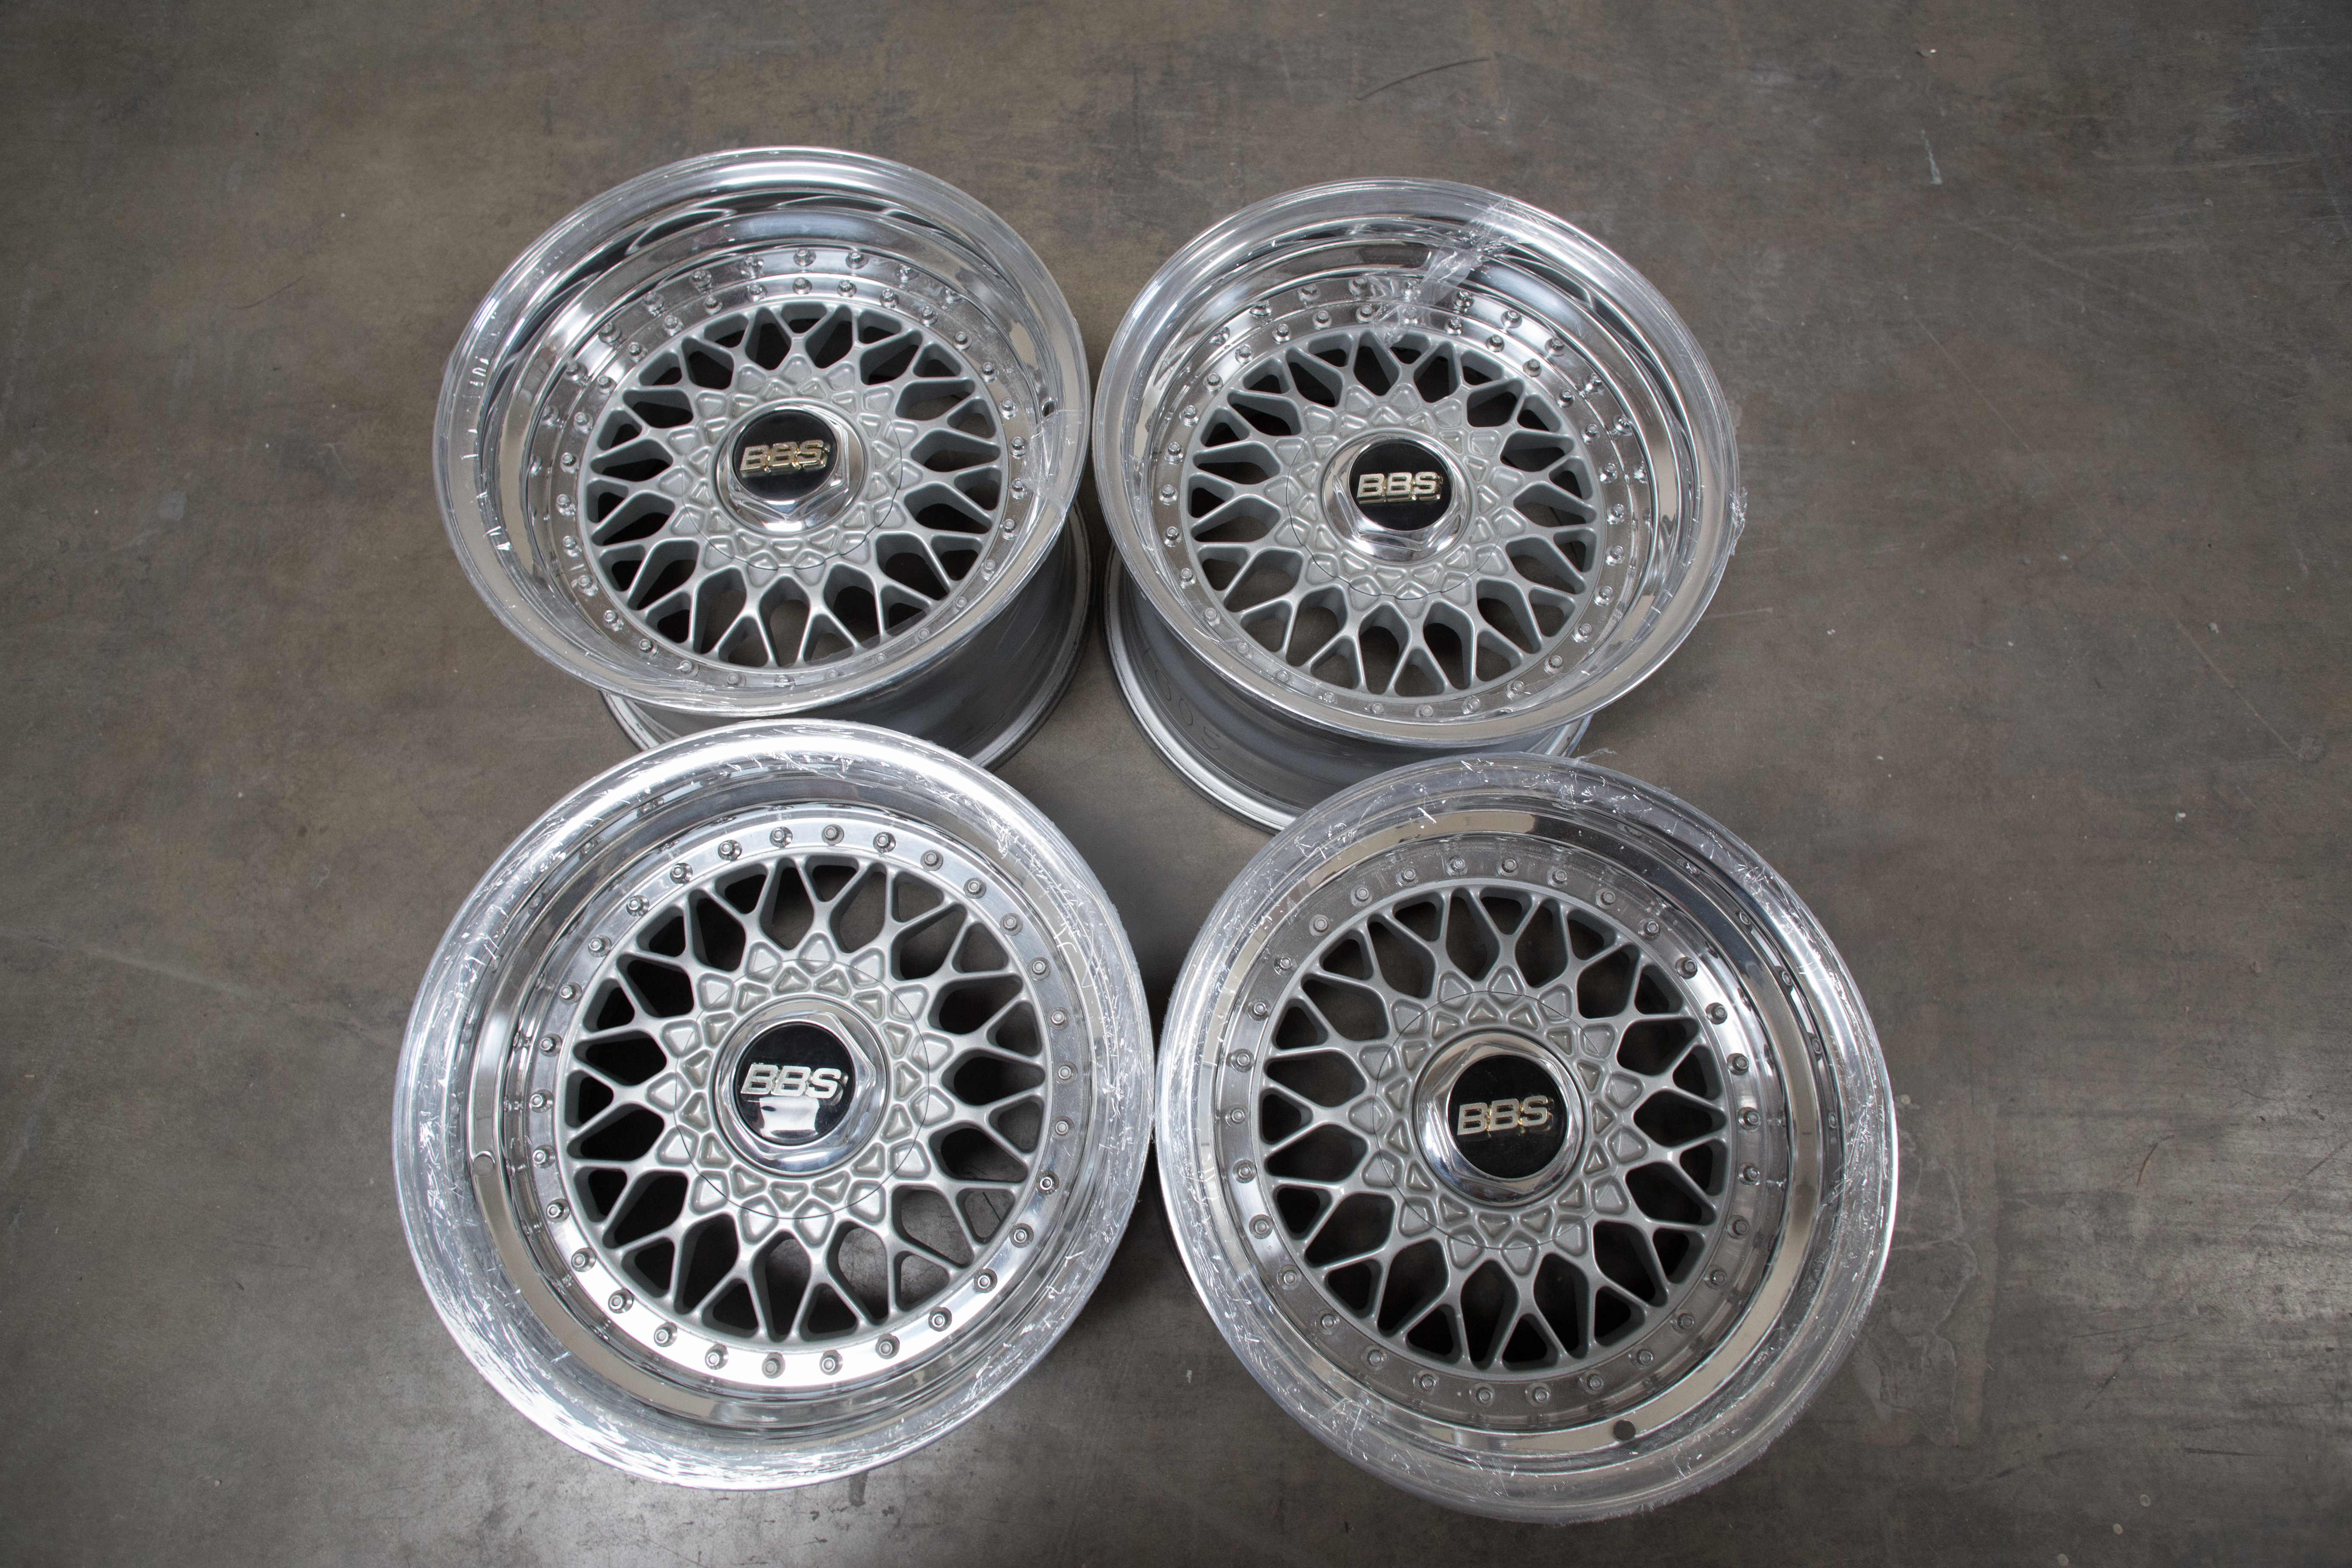 throtl - BBS RS 4X100 15X8 5 +6 15X9+0 wheels